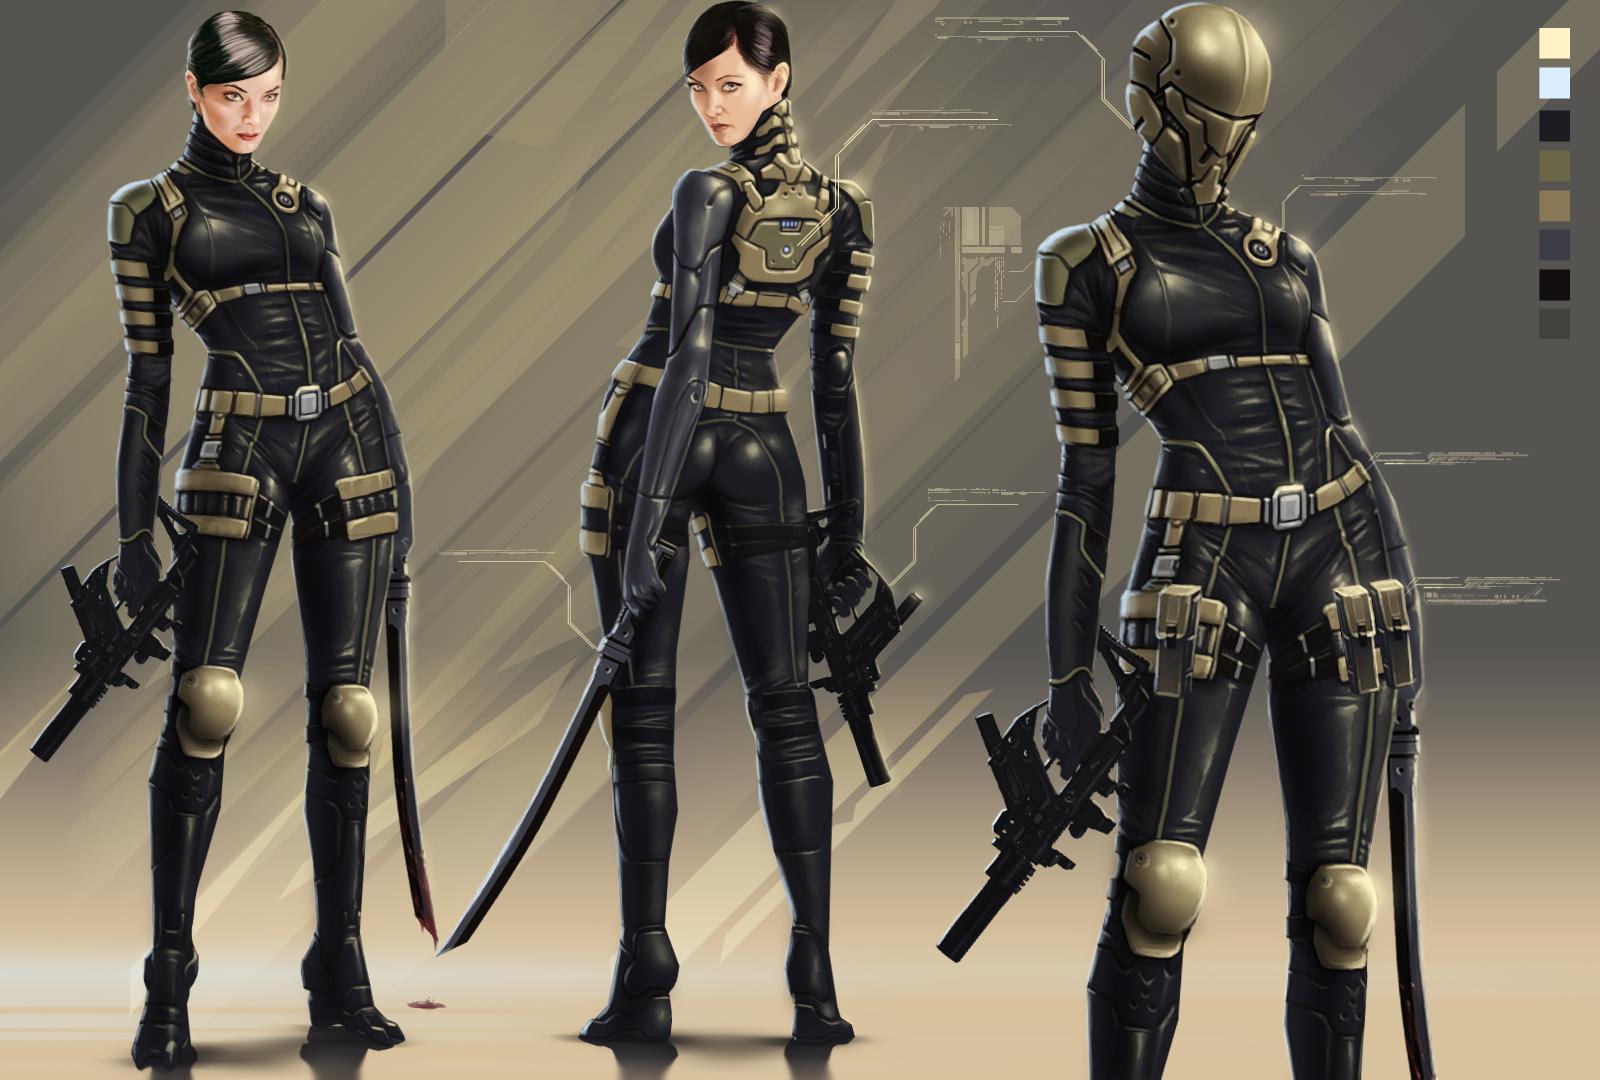 Golden Dragon Assassin Suit By Digitalinkrod On DeviantArt